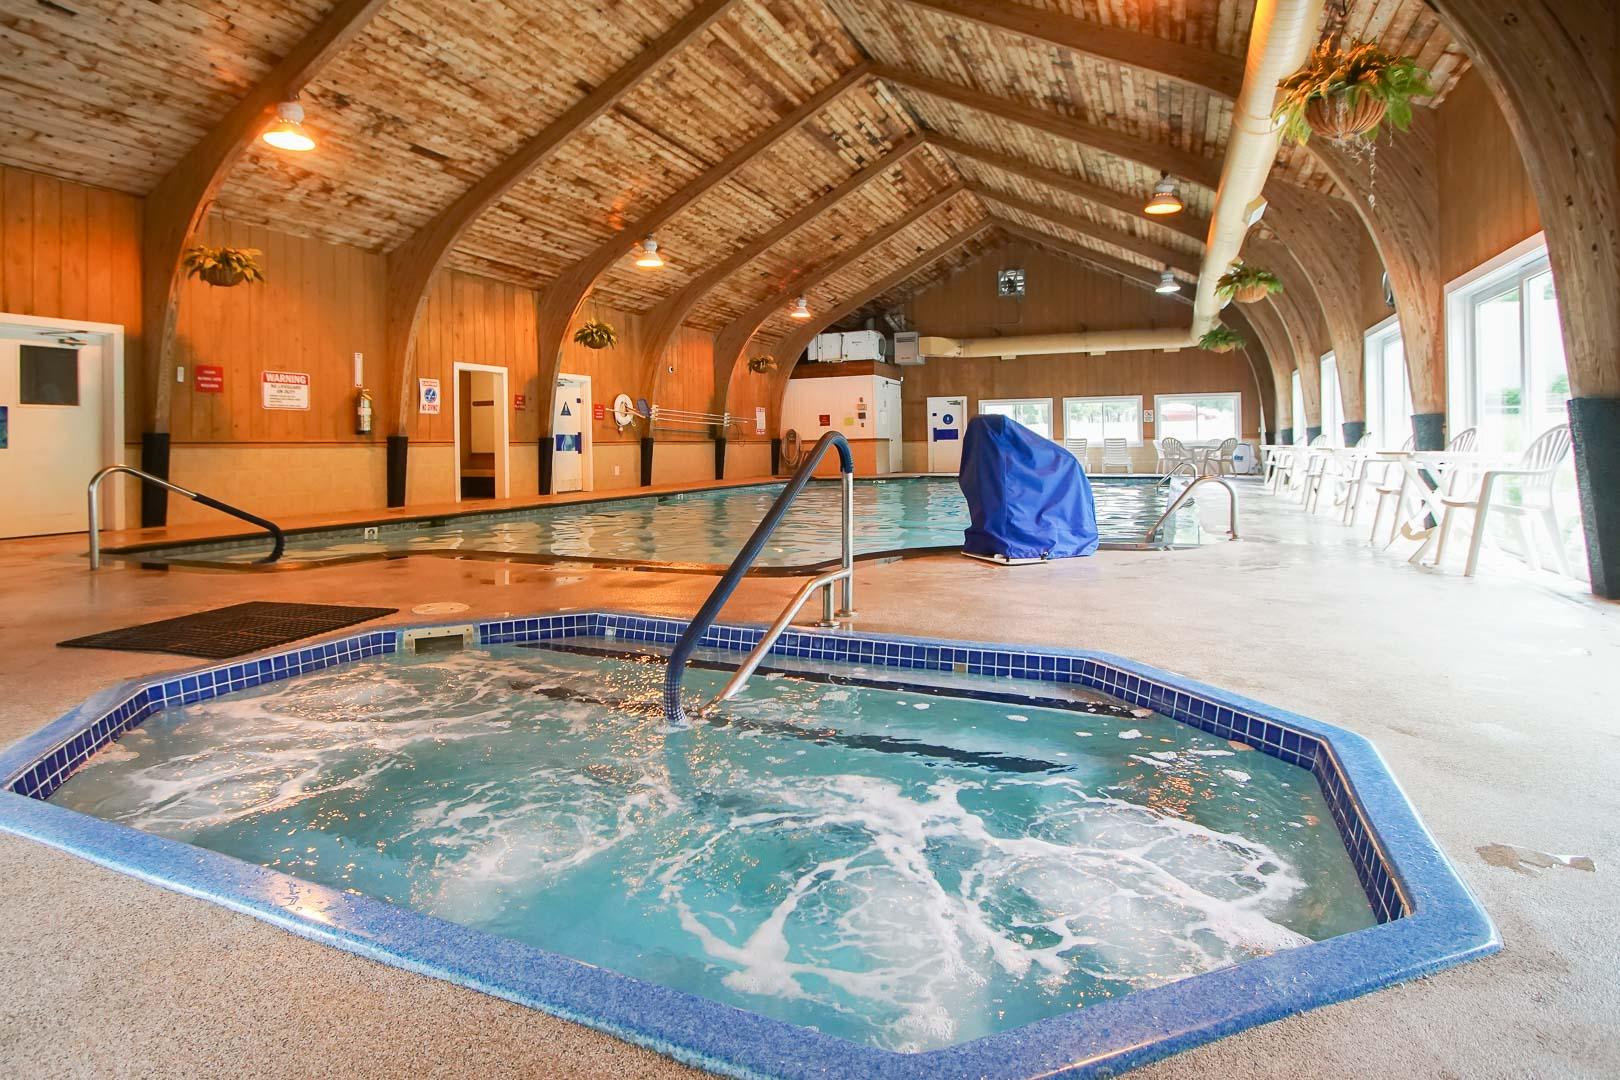 A cozy indoor Jacuzzi at VRI's Brewster Green Resort in Massachusetts.